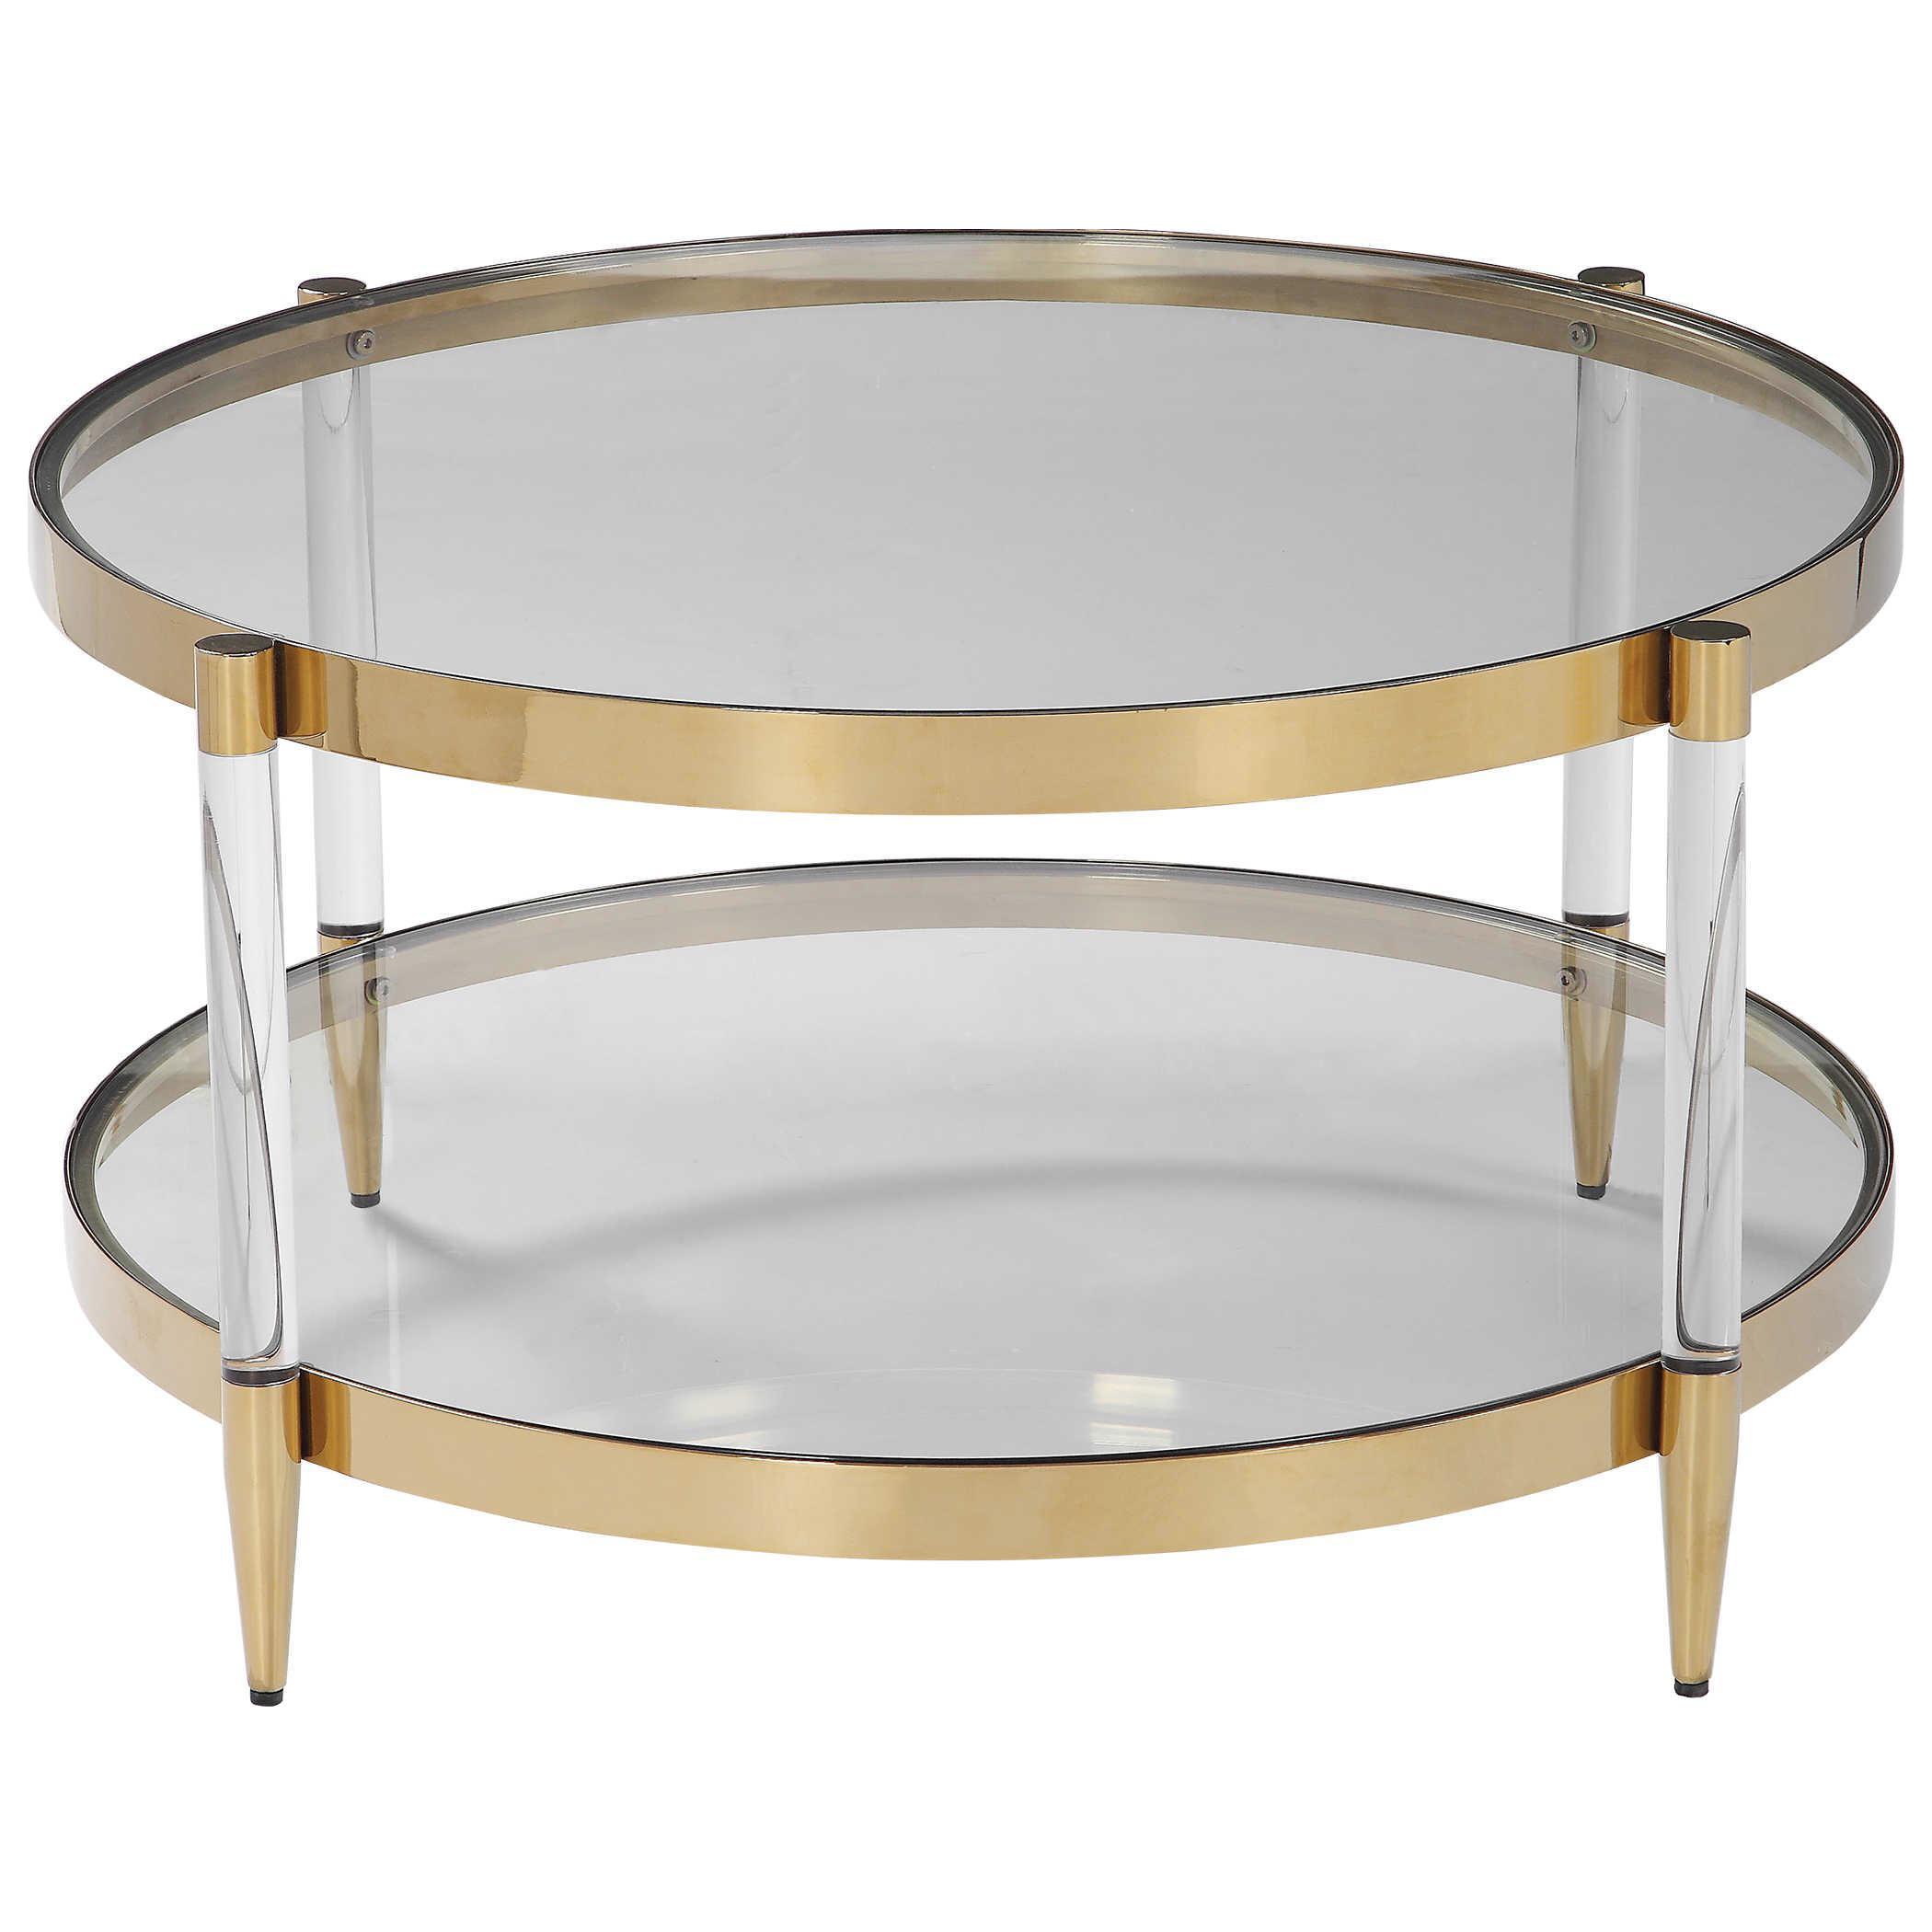 Round Coffee Table Chairish